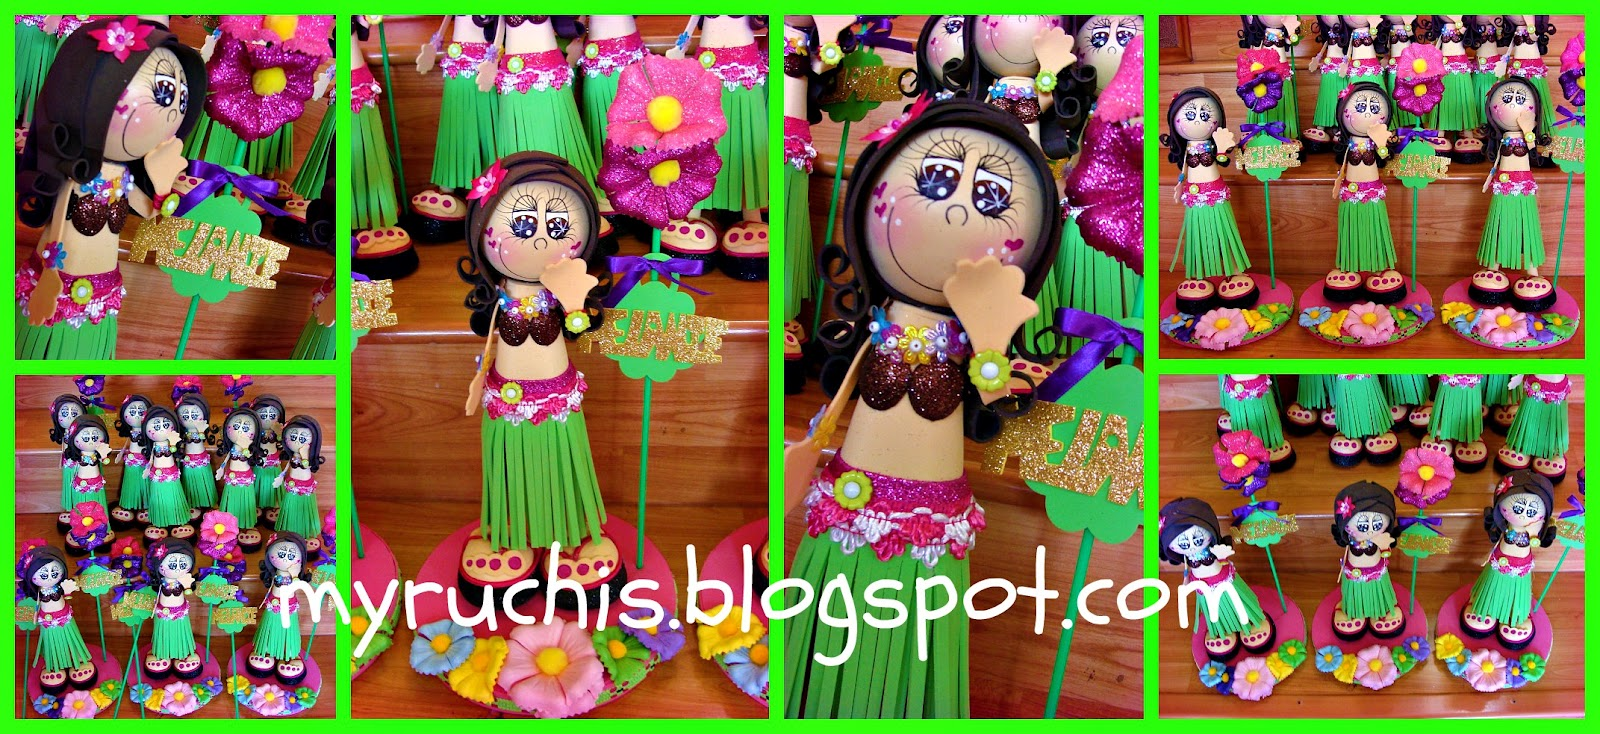 Myruchis ideas para fiestas infantiles hawainas for Ideas para fiestas infantiles